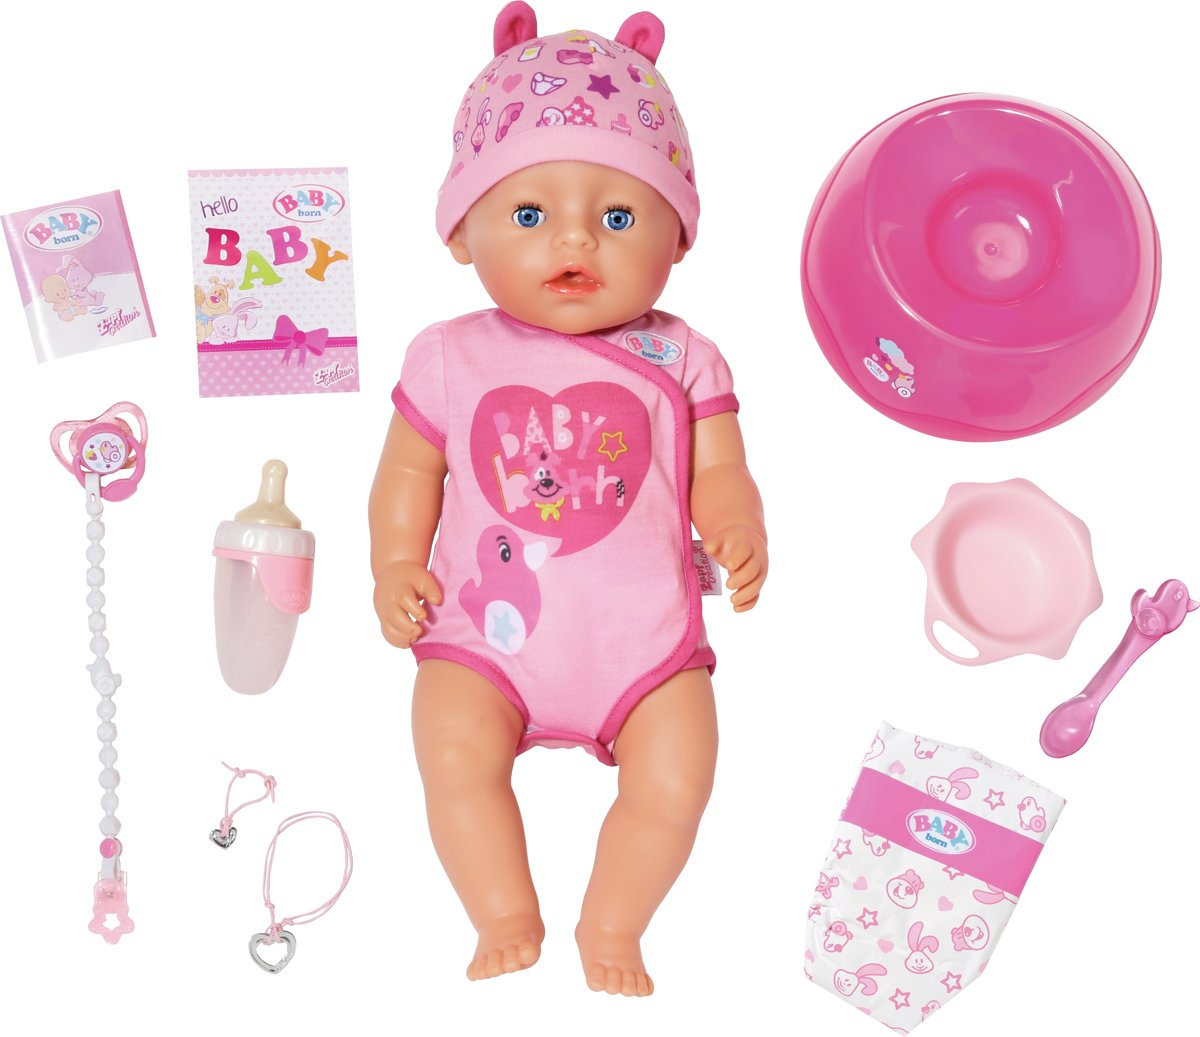 BABY born babypop Soft Touch 43 cm roze 8 delig